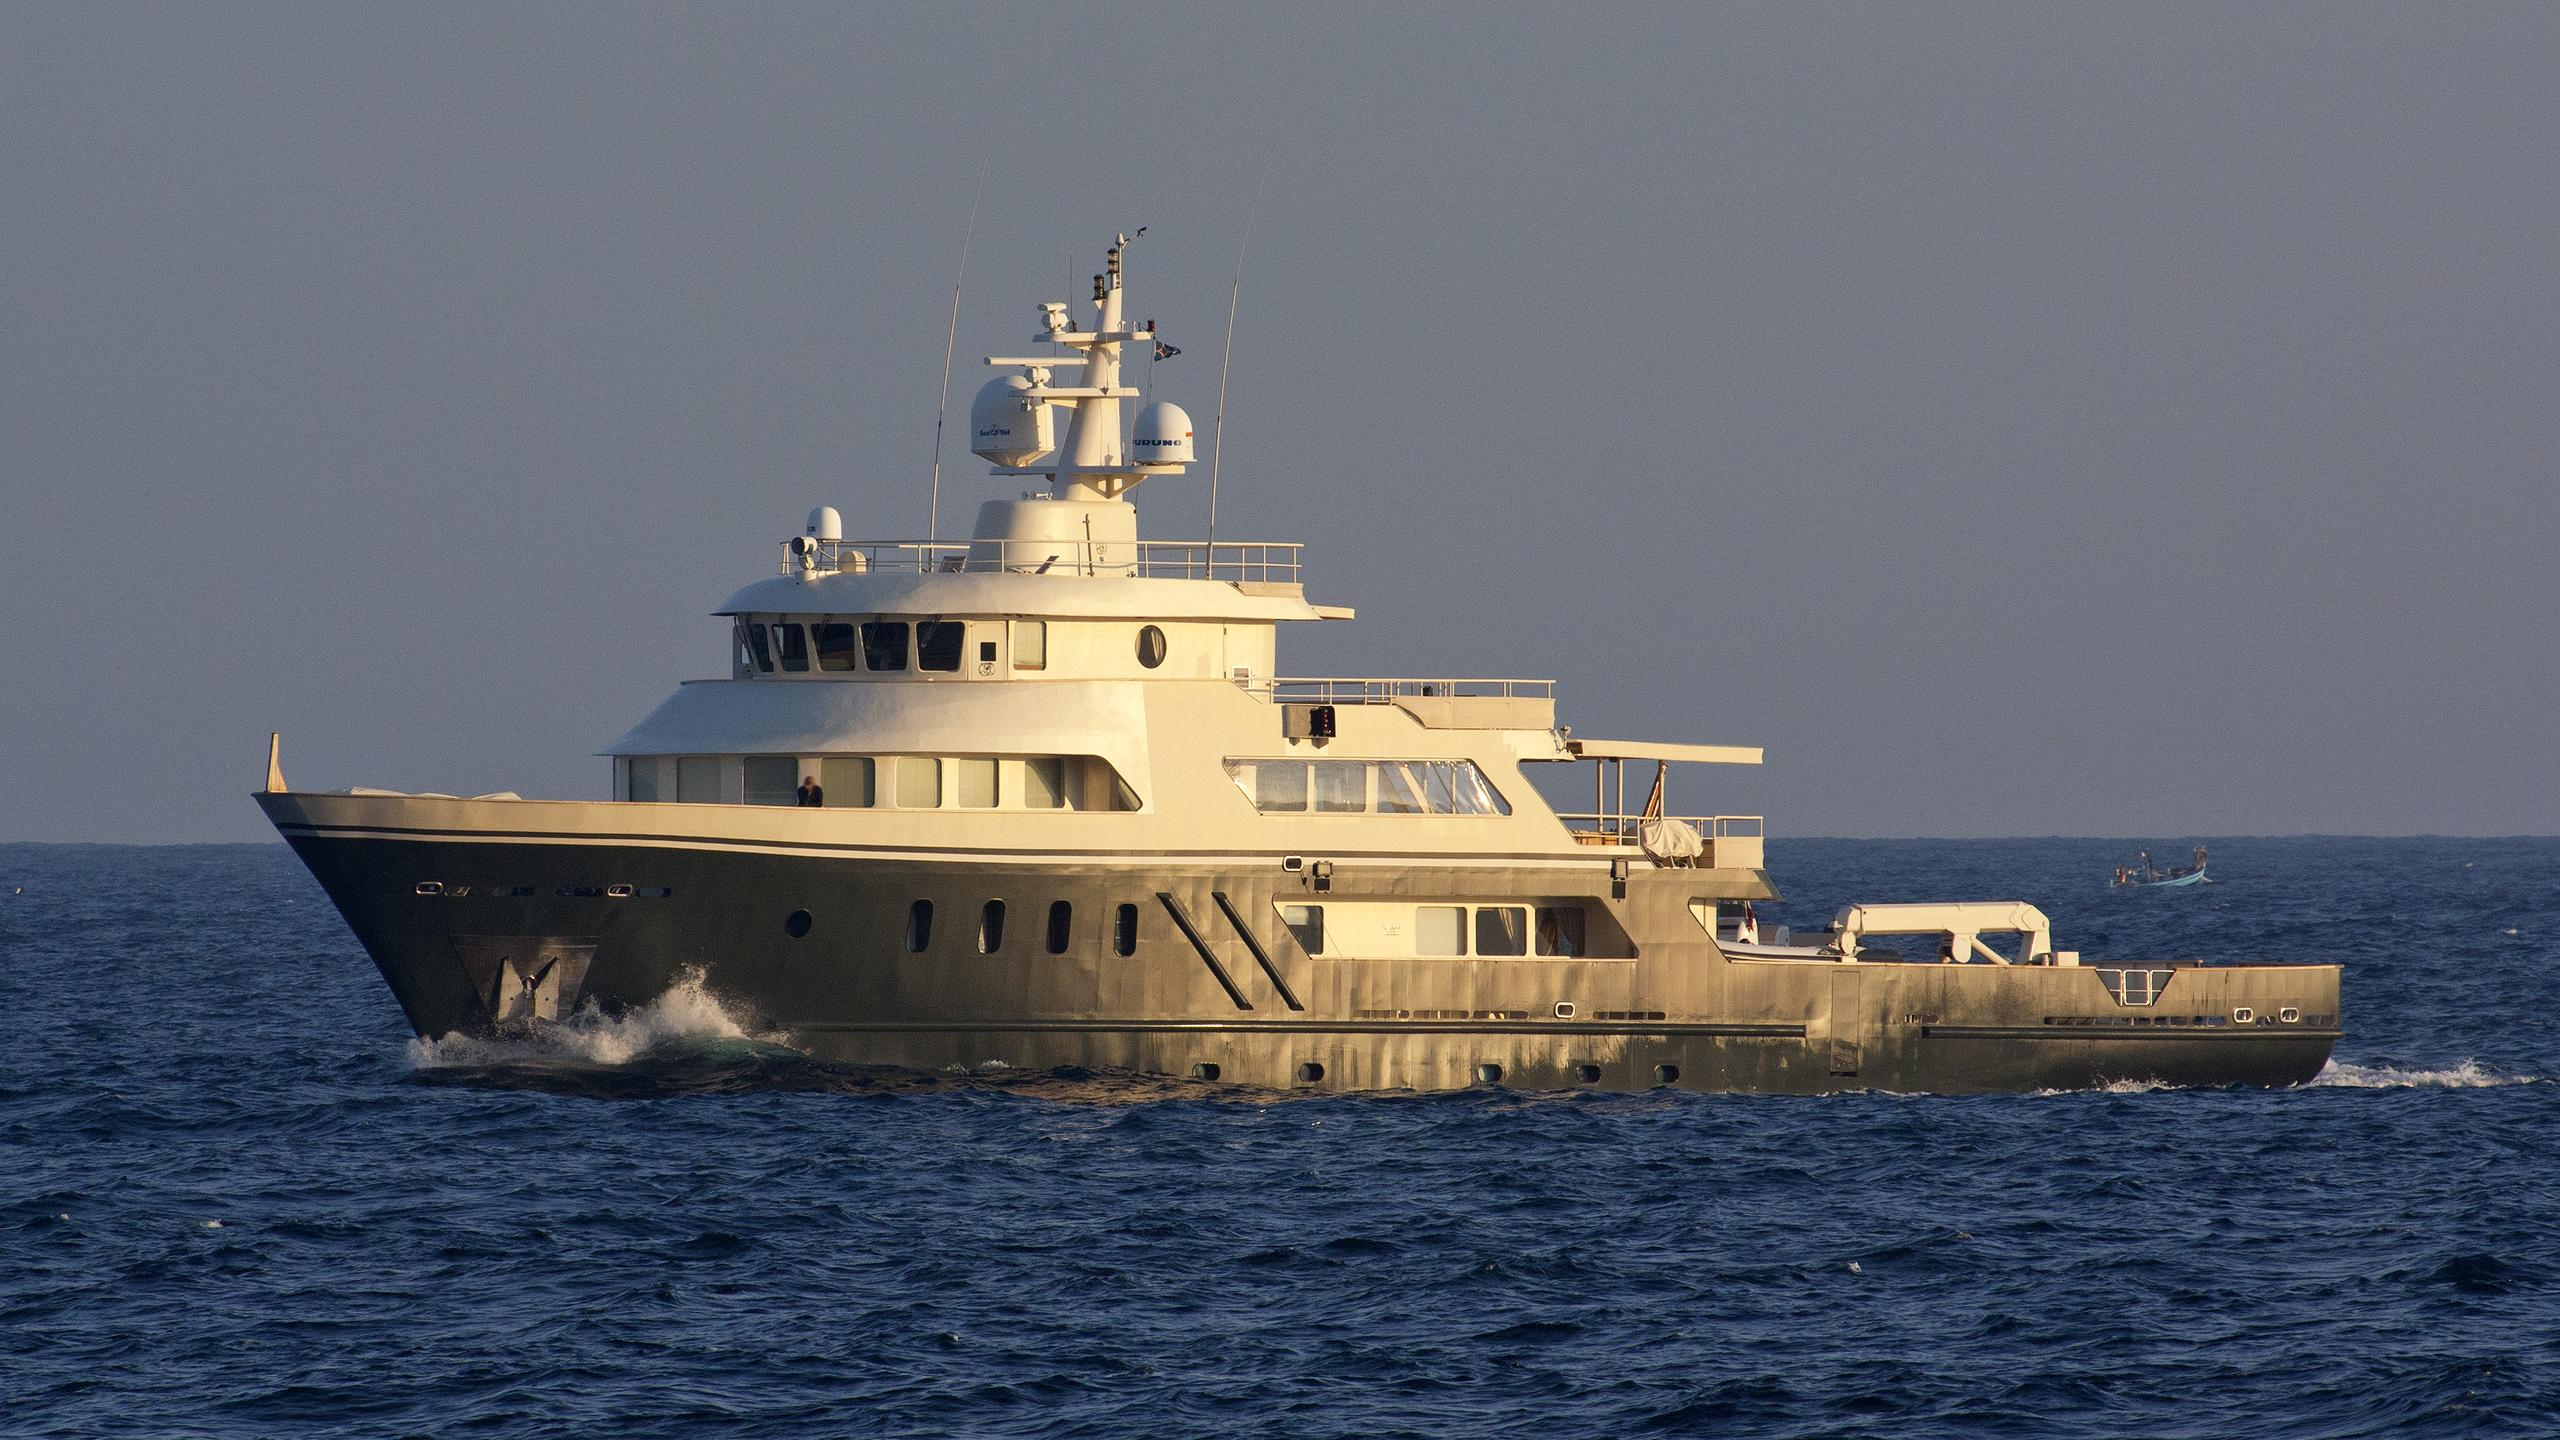 etra explorer yacht penglai bohai lusben 2006 45m cruising before refit